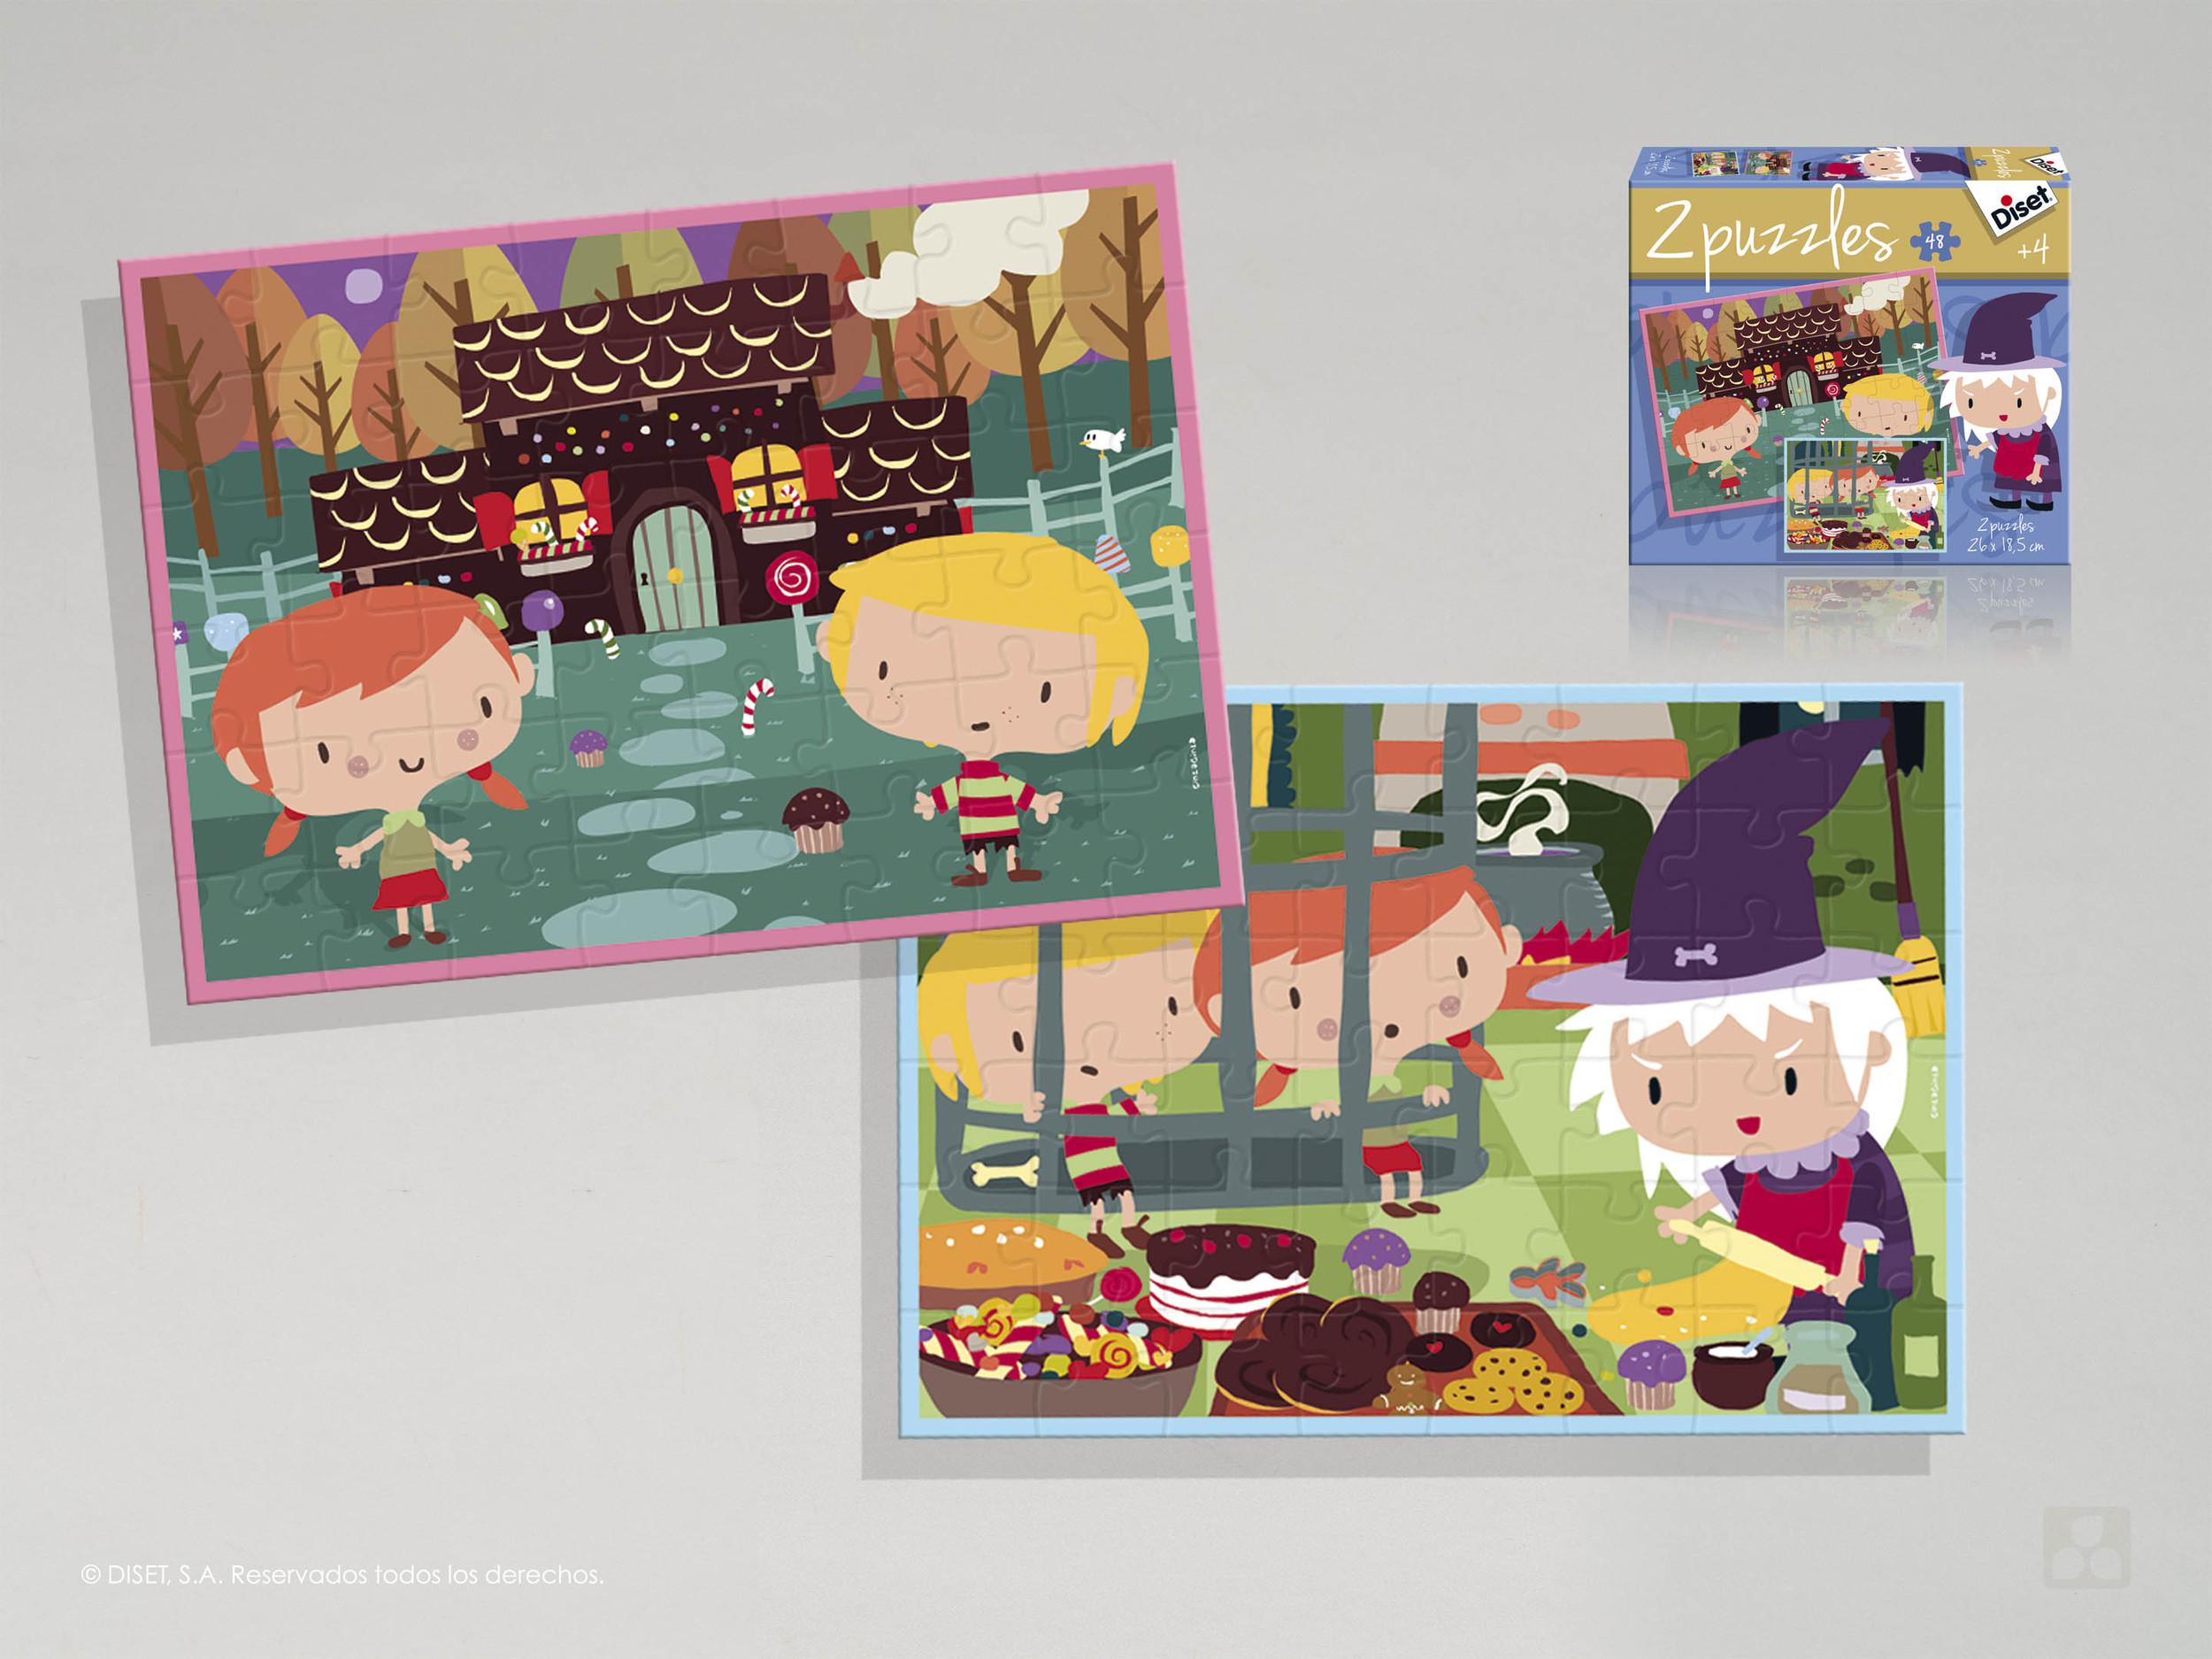 2puzzles02.jpg